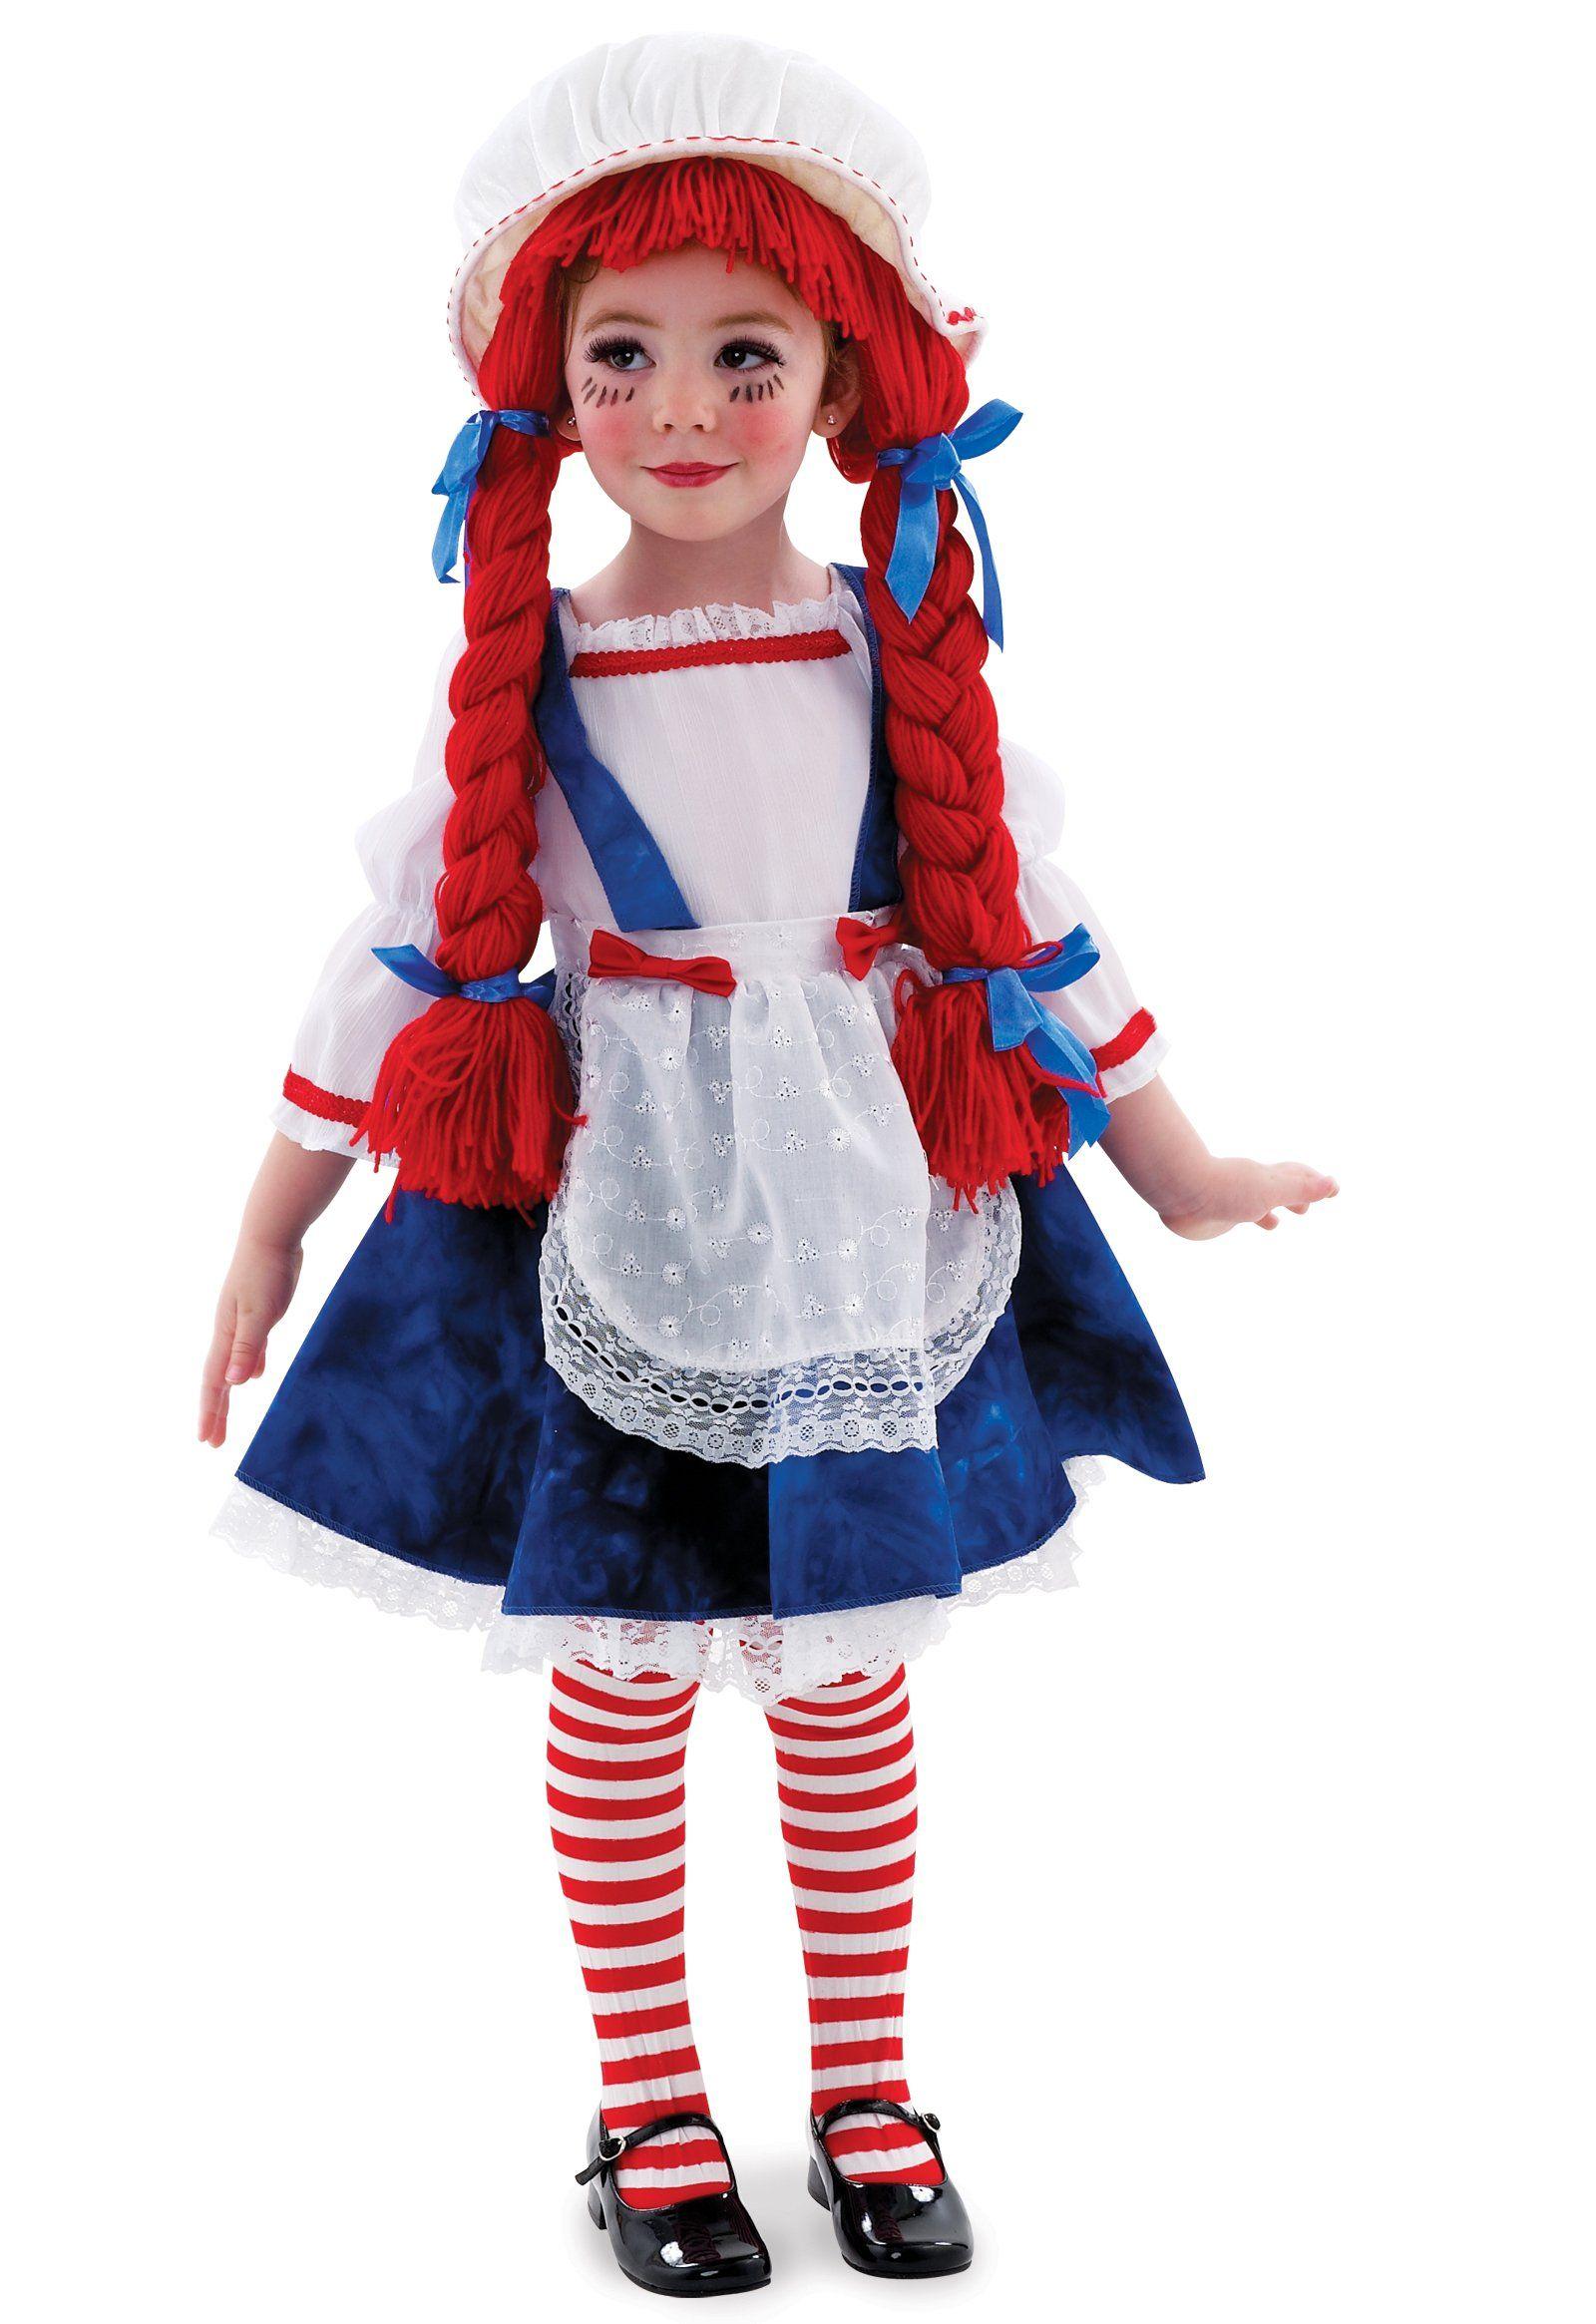 yarn babies rag doll girl toddler / child costume in 2018 | kid's